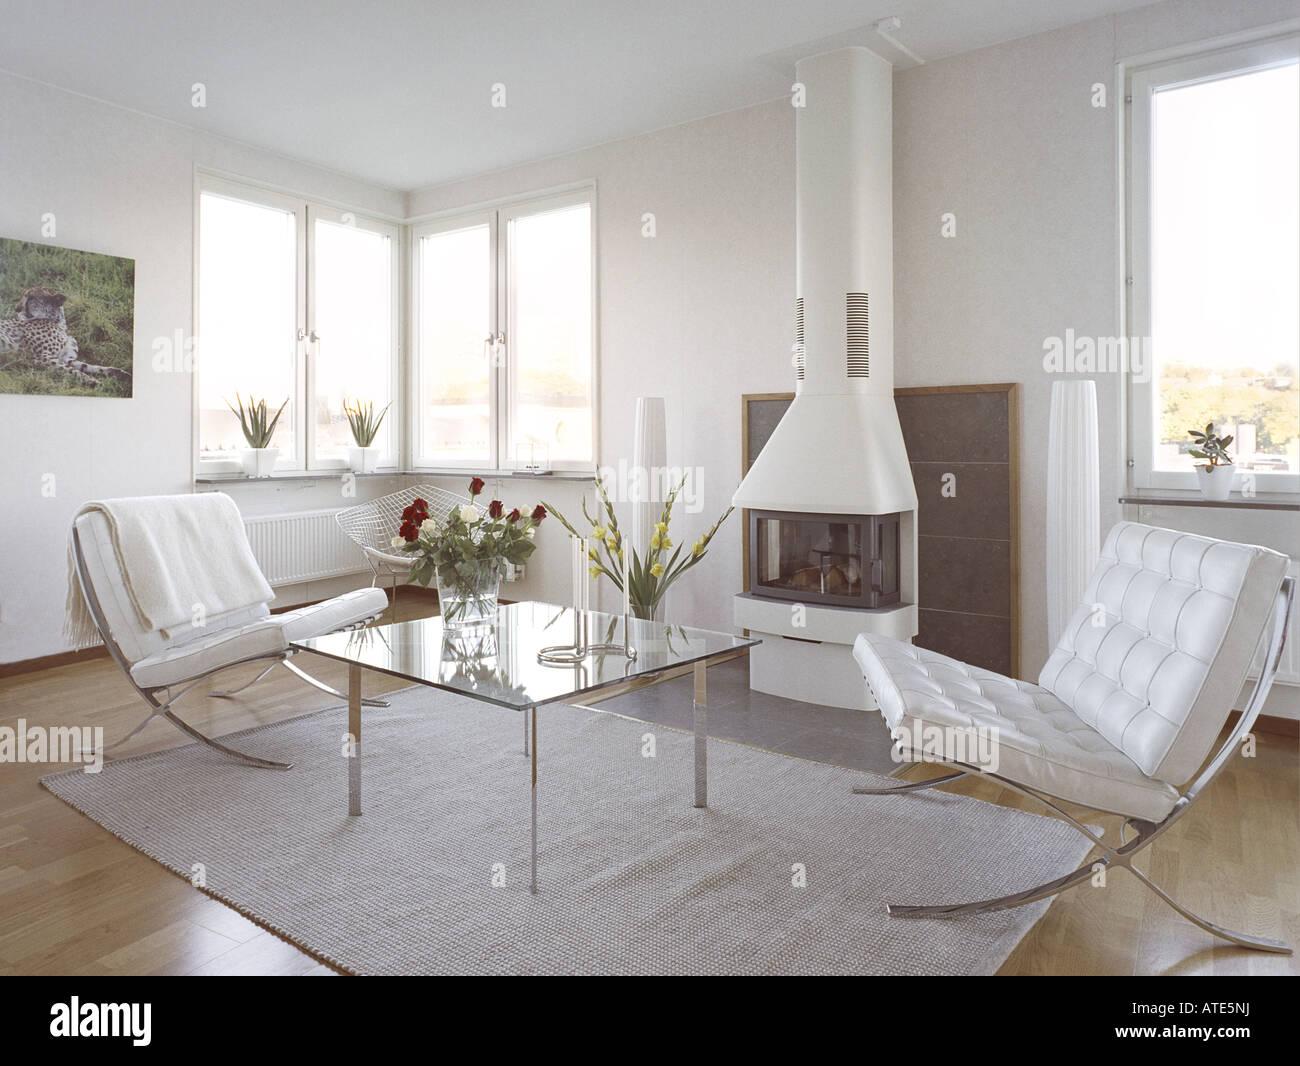 Moderne Trendige Skandinavische Inneneinrichtung Kamin Glas Stockfotografie Alamy